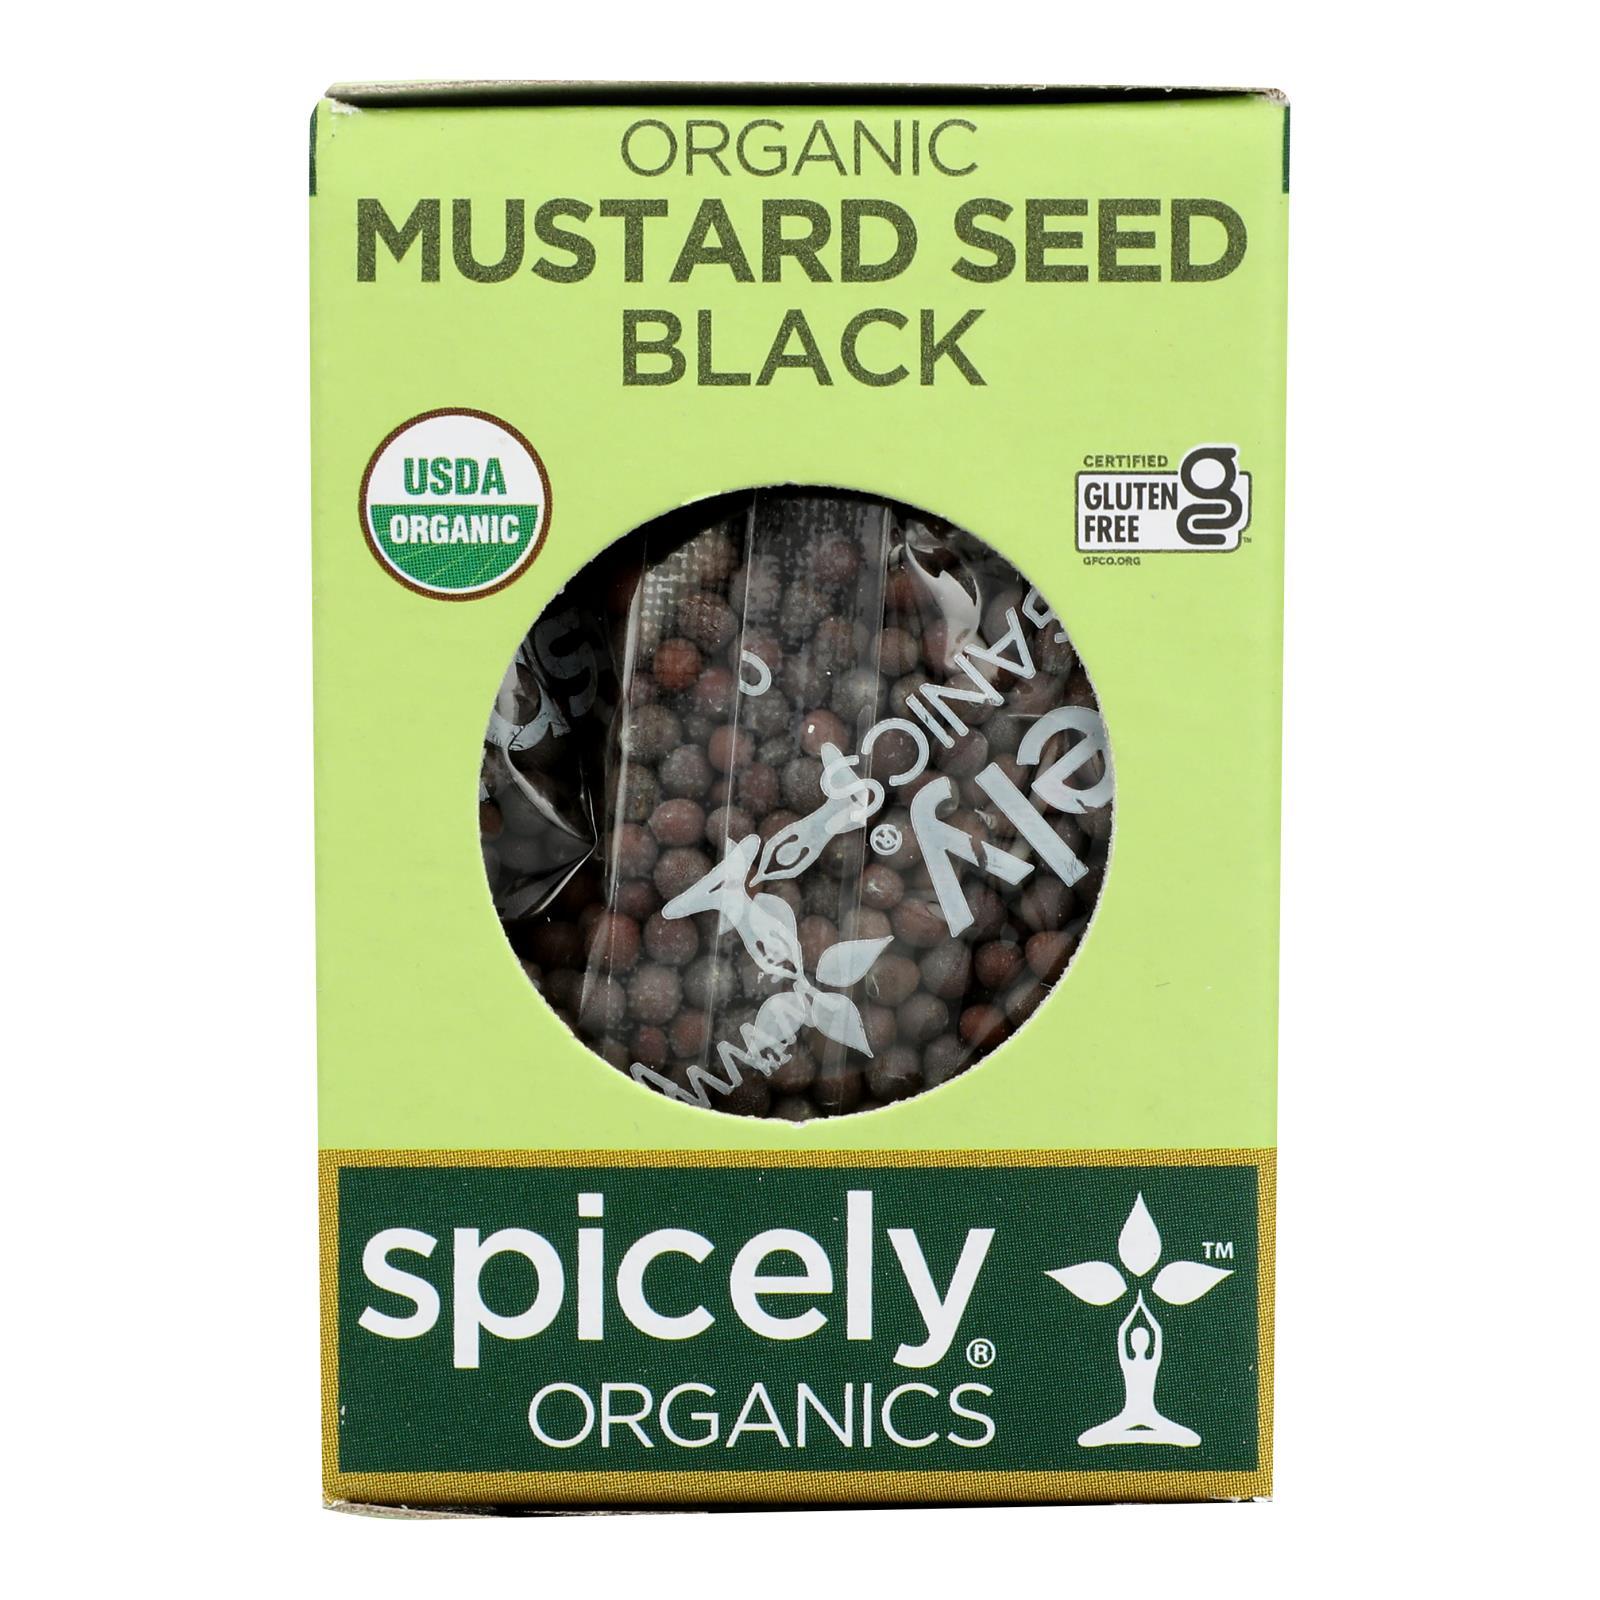 Spicely Organics - Organic Mustard Seed - Black - Case of 6 - 0.5 oz.